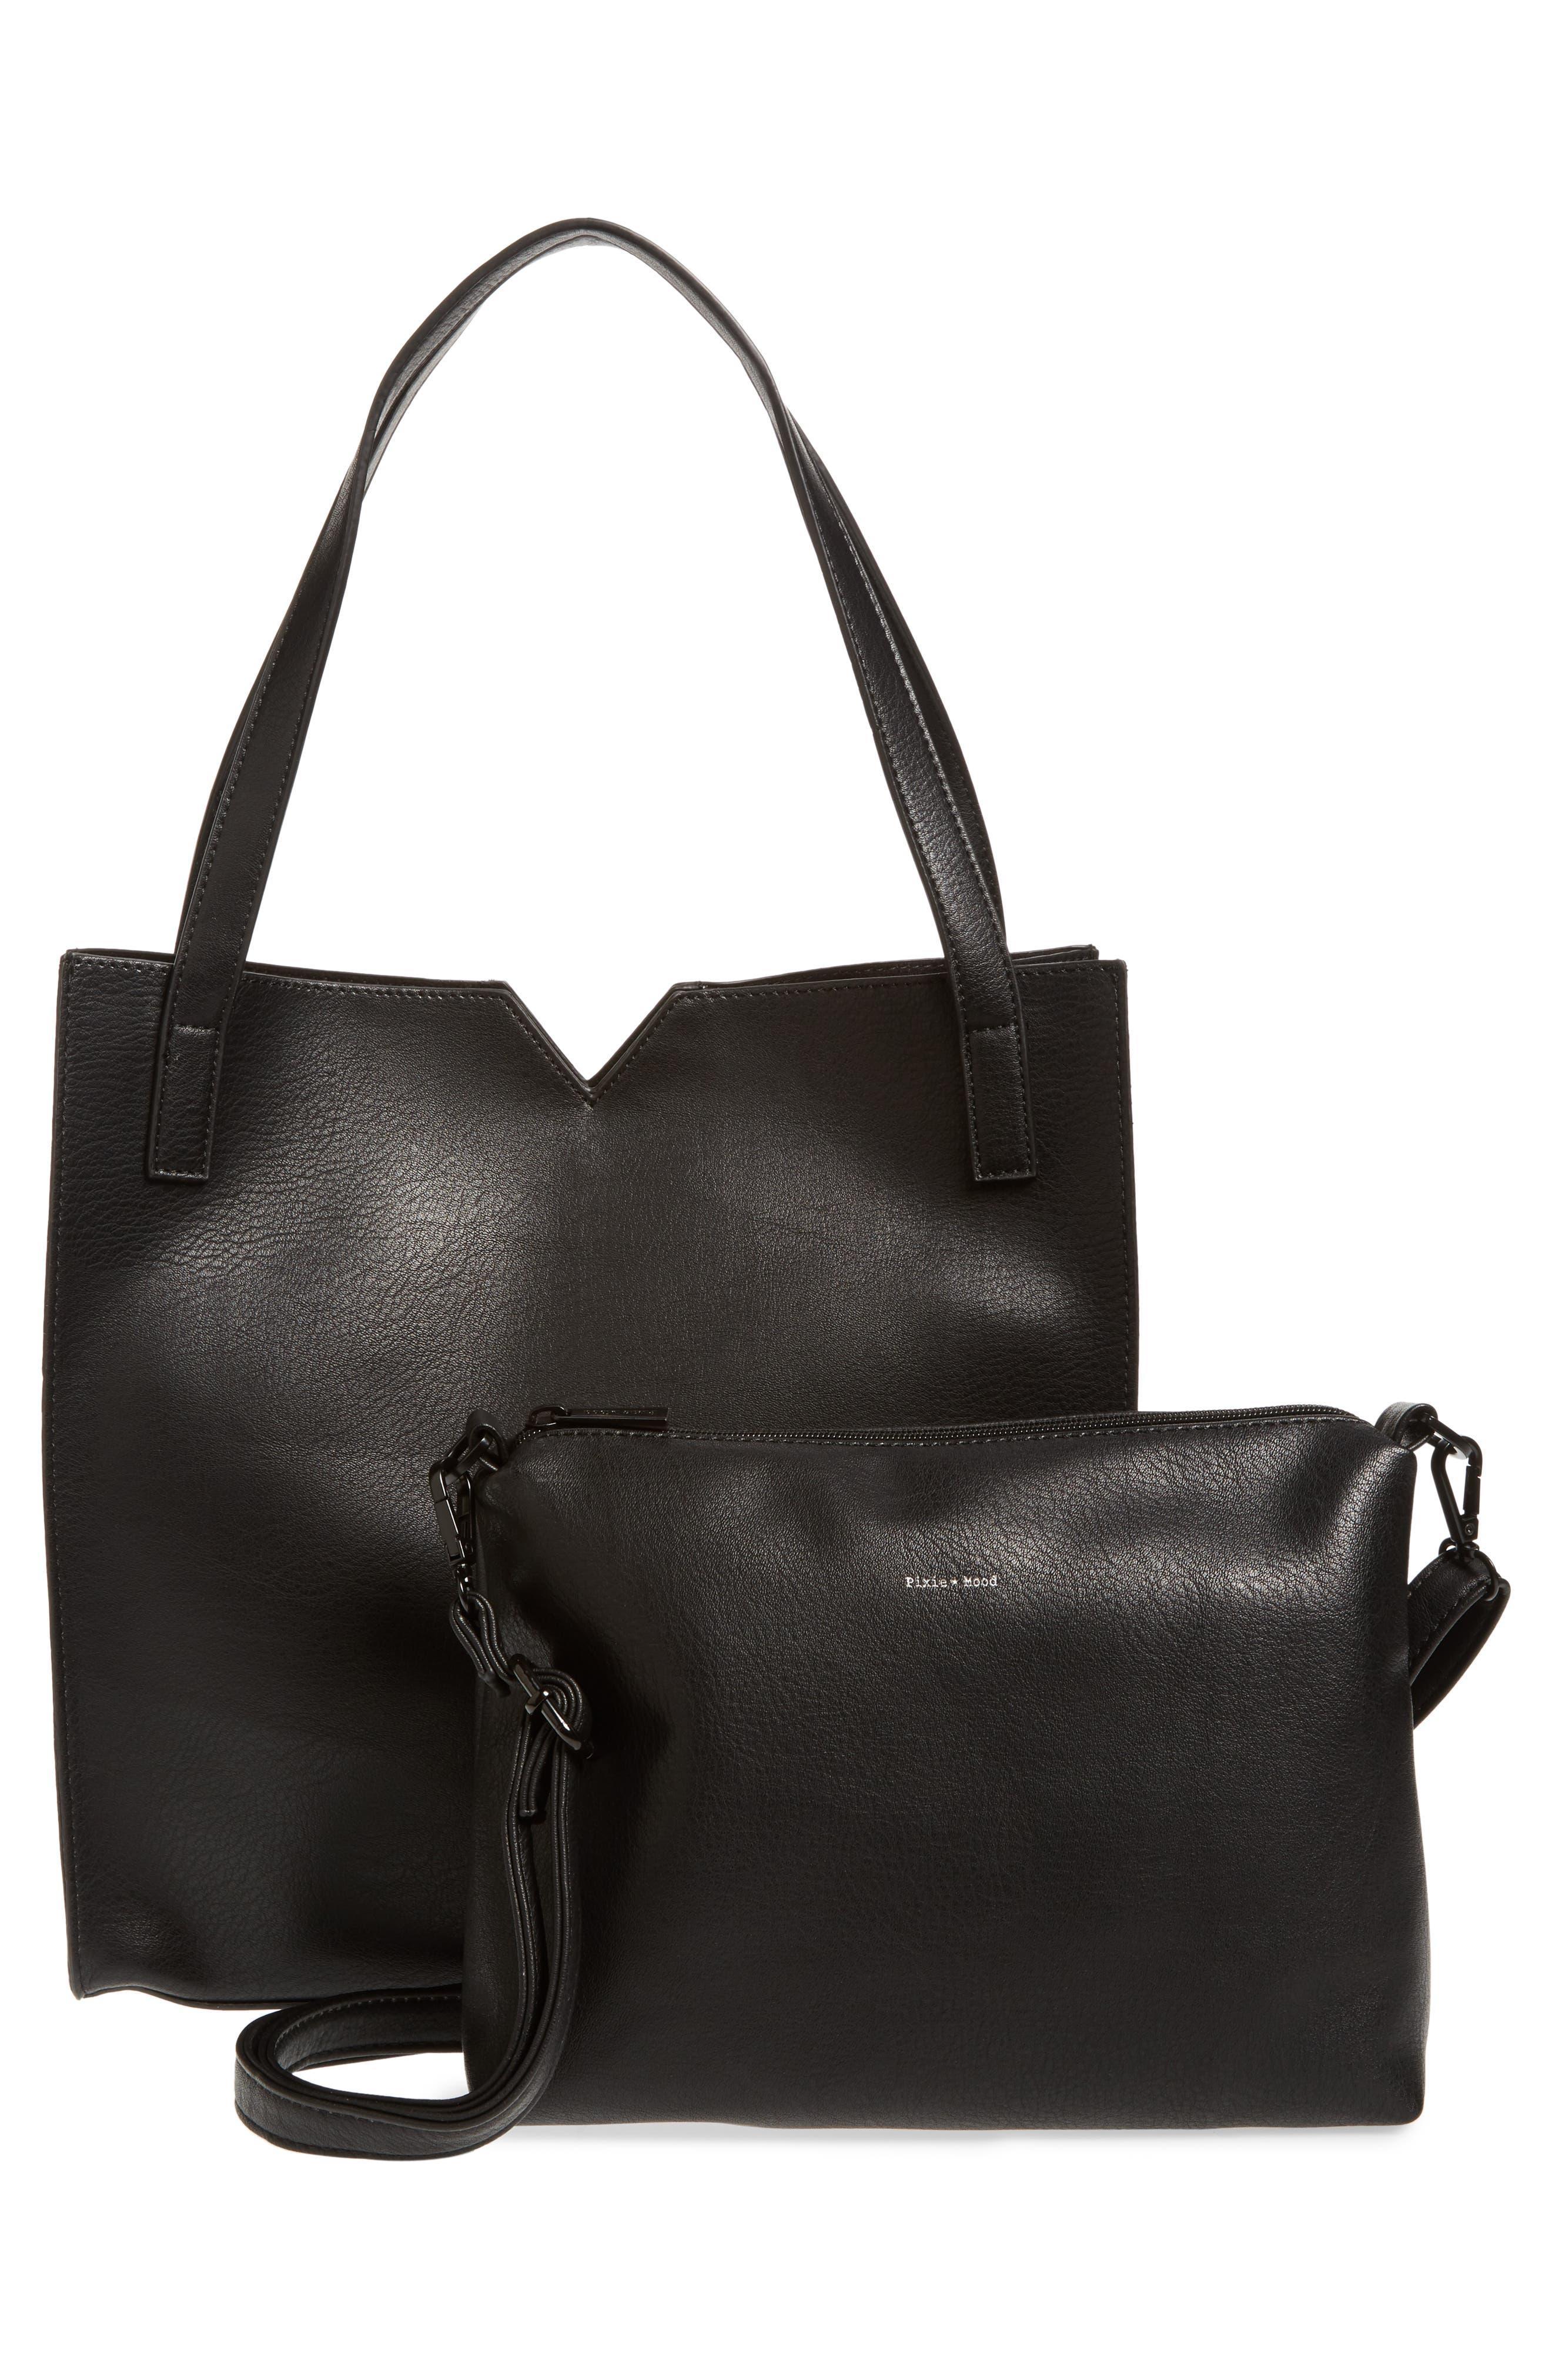 Alicia Faux Leather Tote Bag & Pouch Set,                             Alternate thumbnail 3, color,                             001